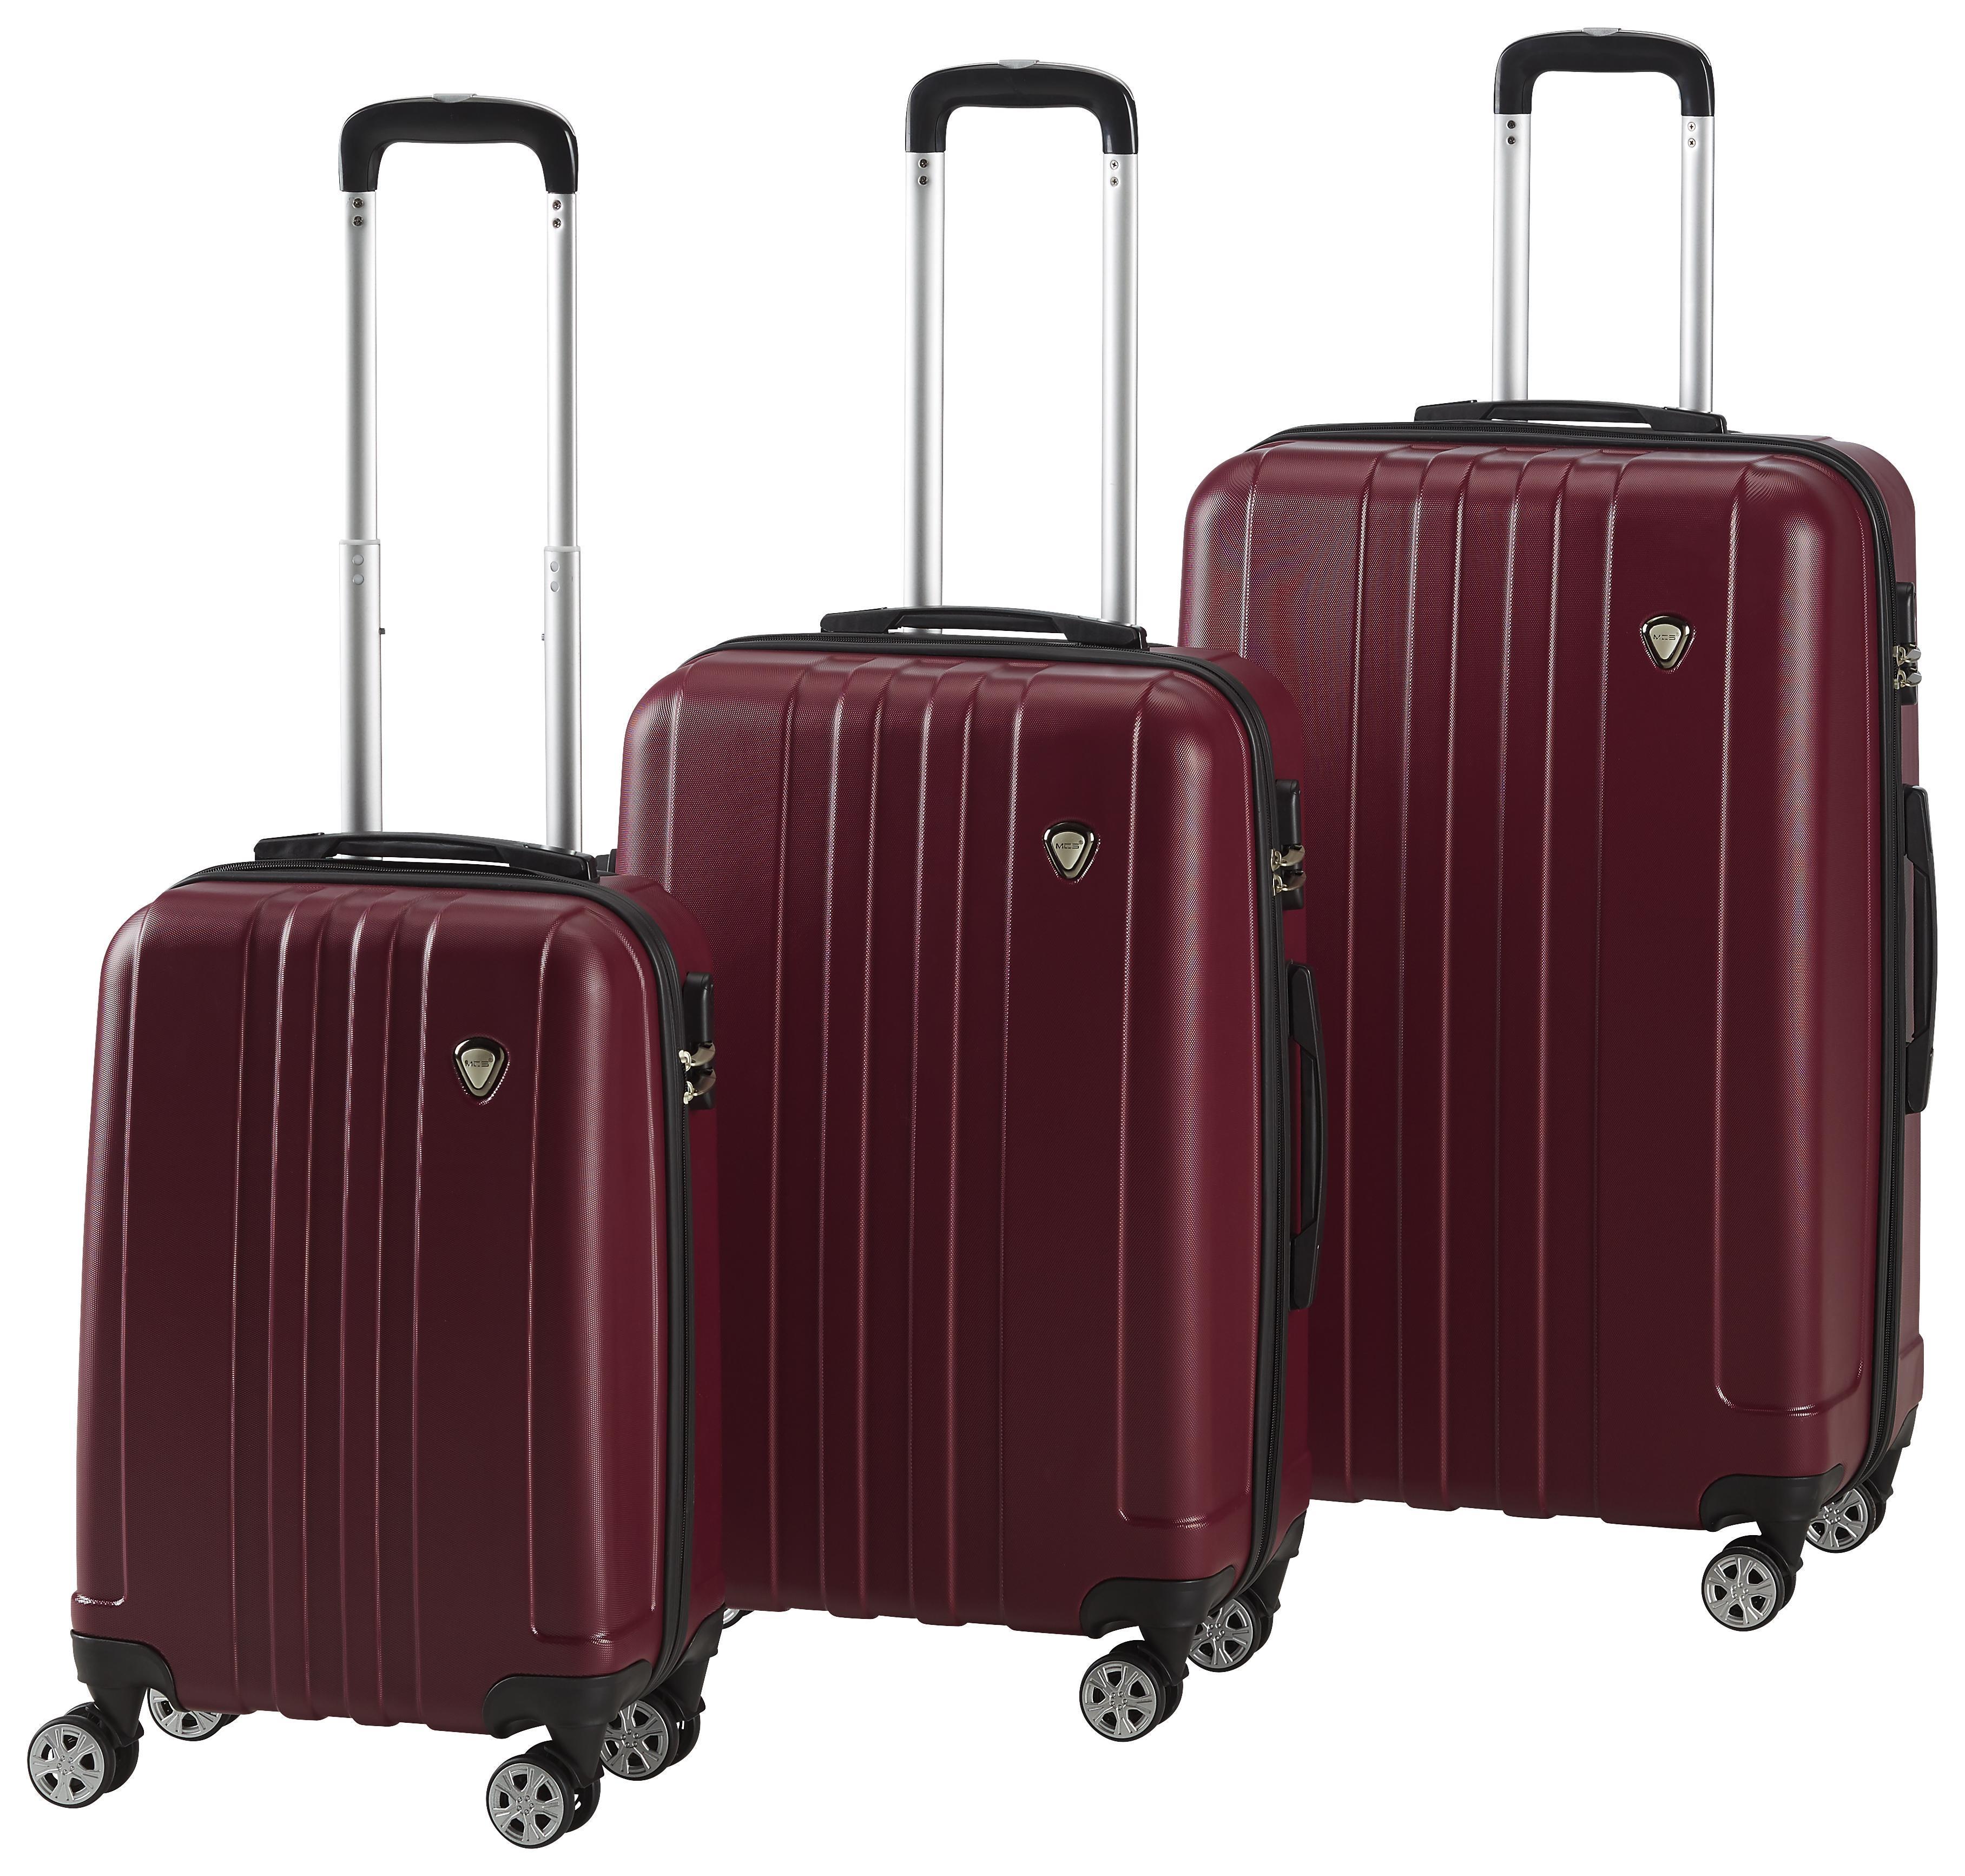 949104cece8af Sada Cestovných Kufrov Mallorca Kúpiť online ➤ Möbelix